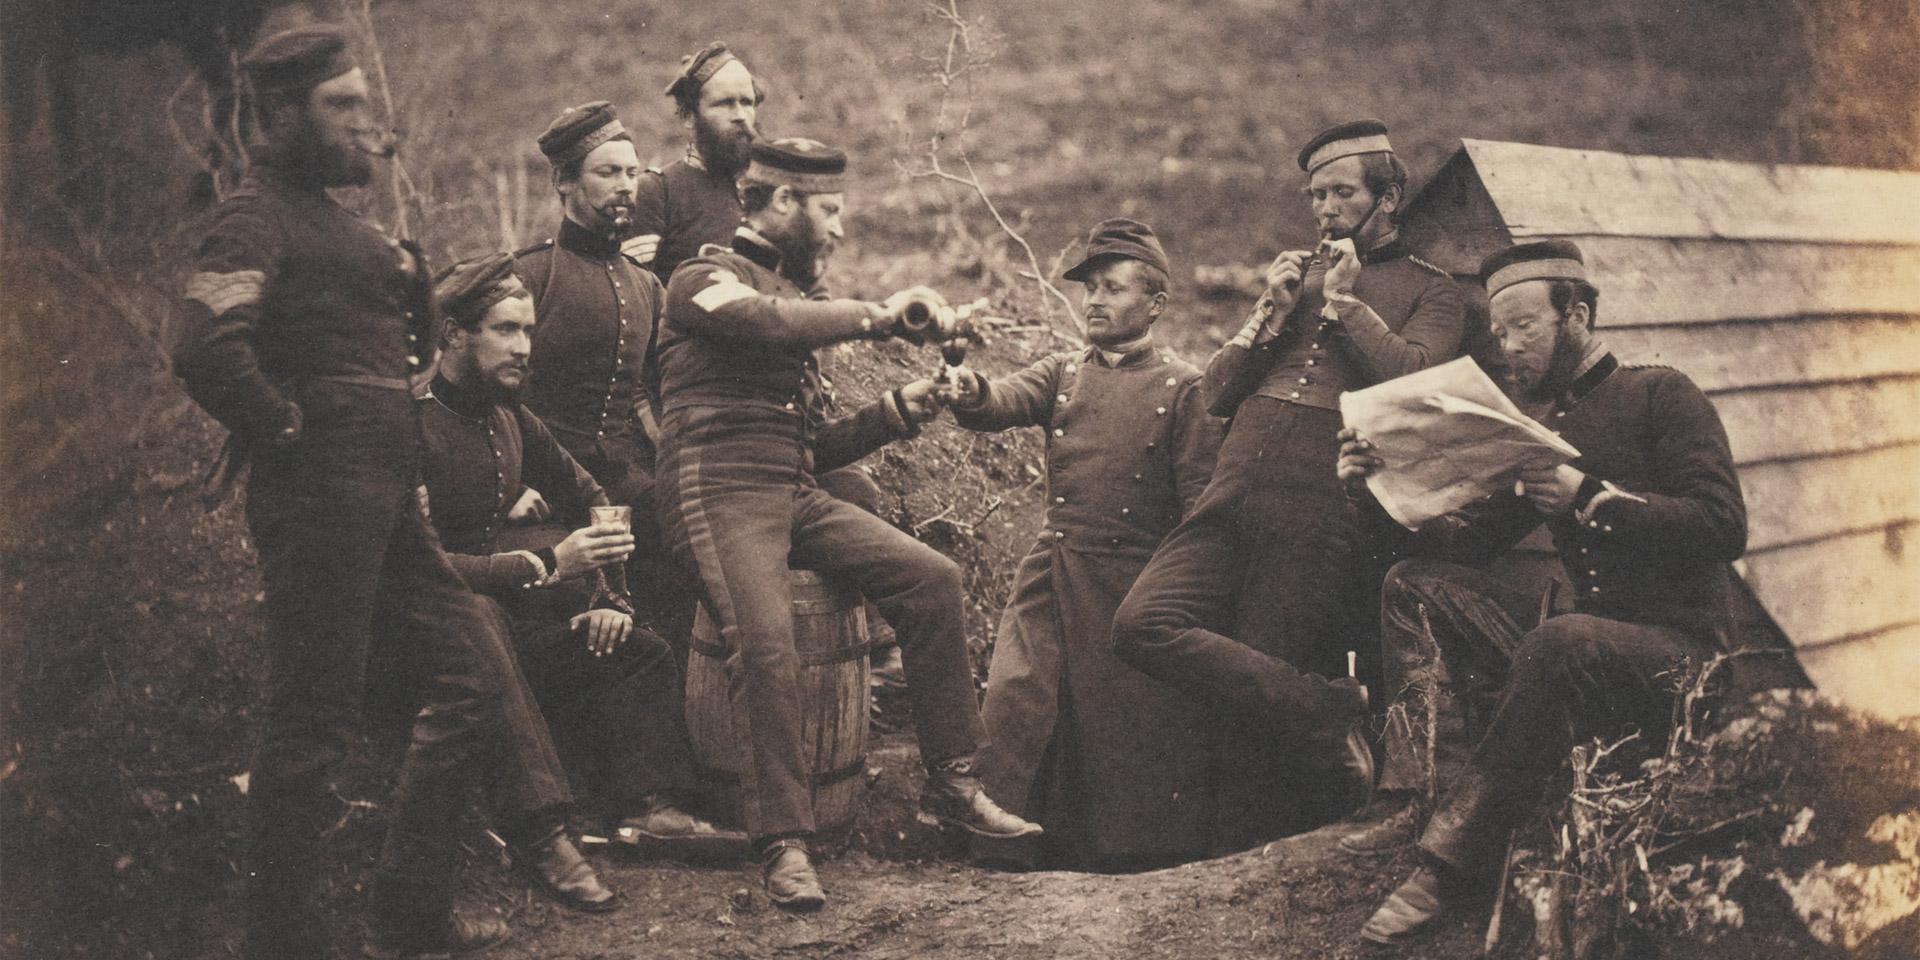 'L'Entente Cordiale', Crimea, 1855